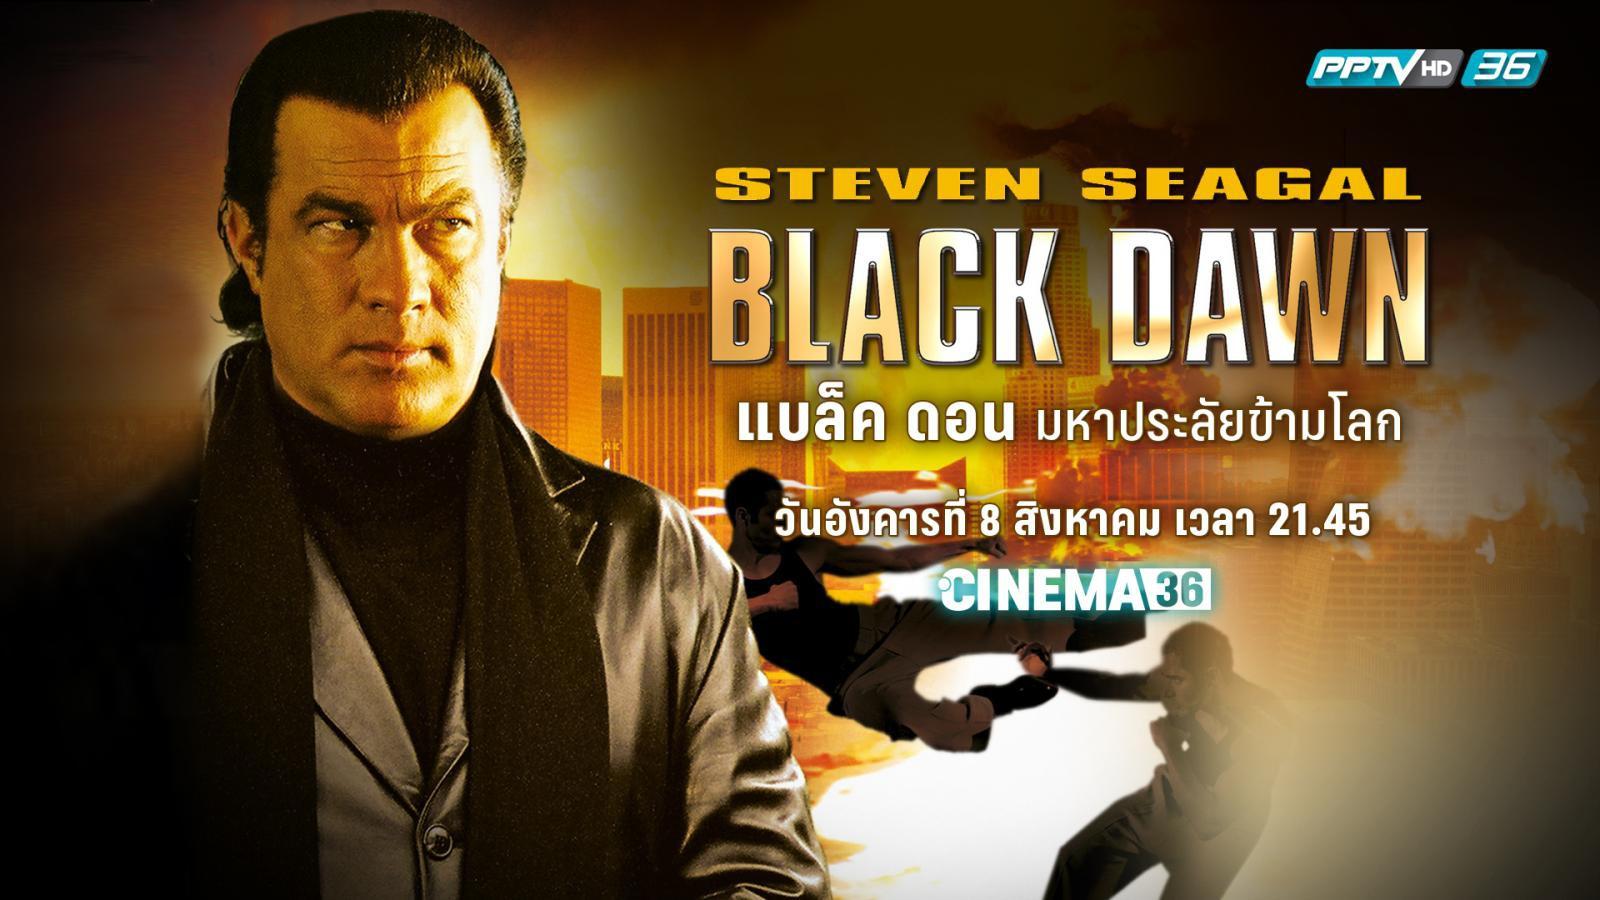 Black Dawn แบล็ค ดอน  มหาประลัยข้ามโลก